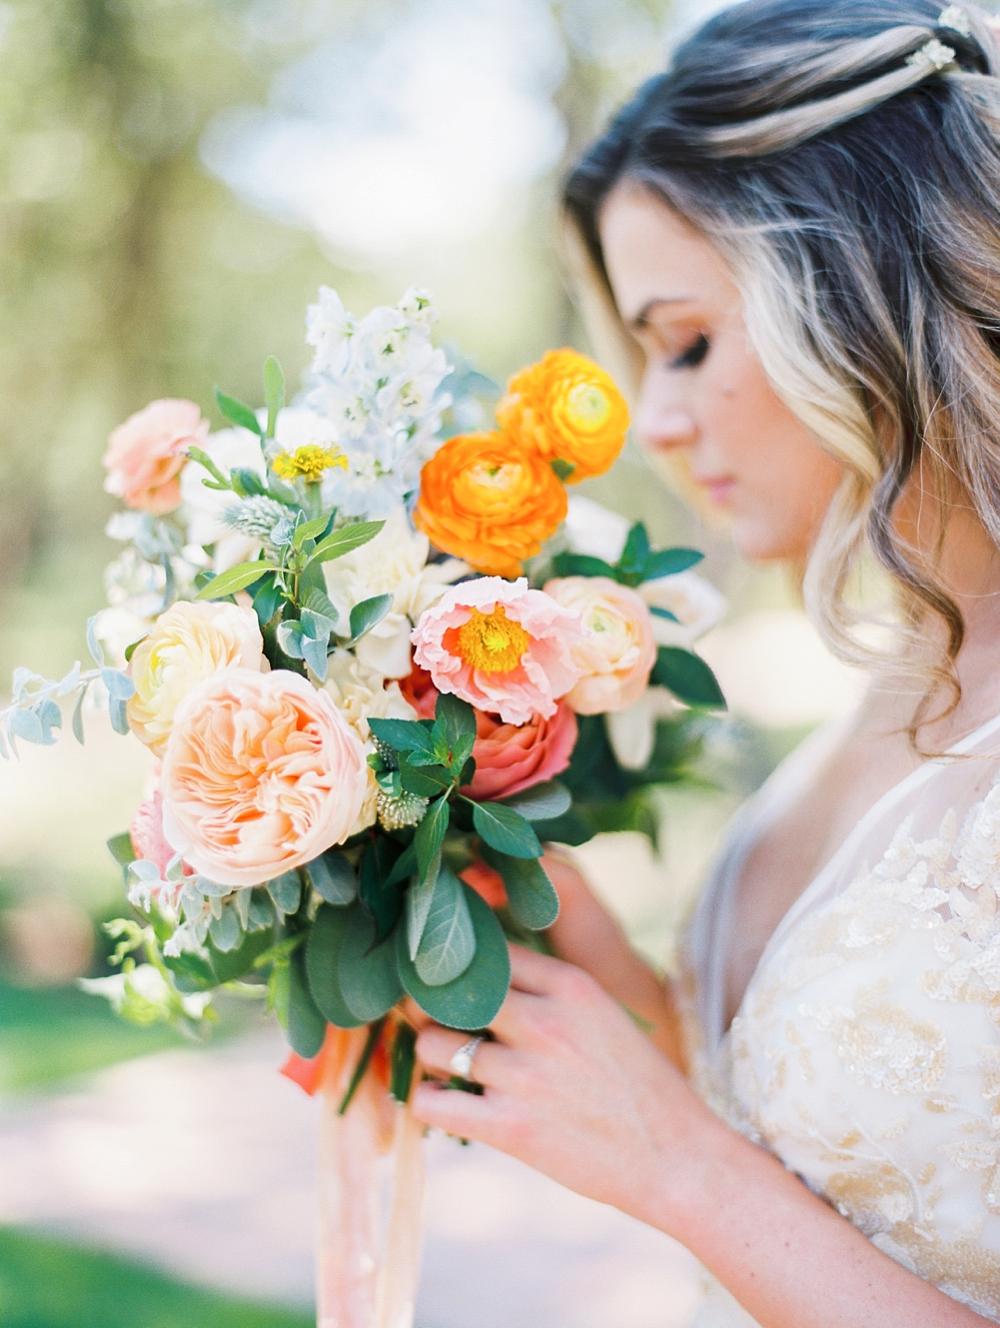 Kristin-La-Voie-Photography-Austin-Wedding-Photographer-the-grand-lady-3